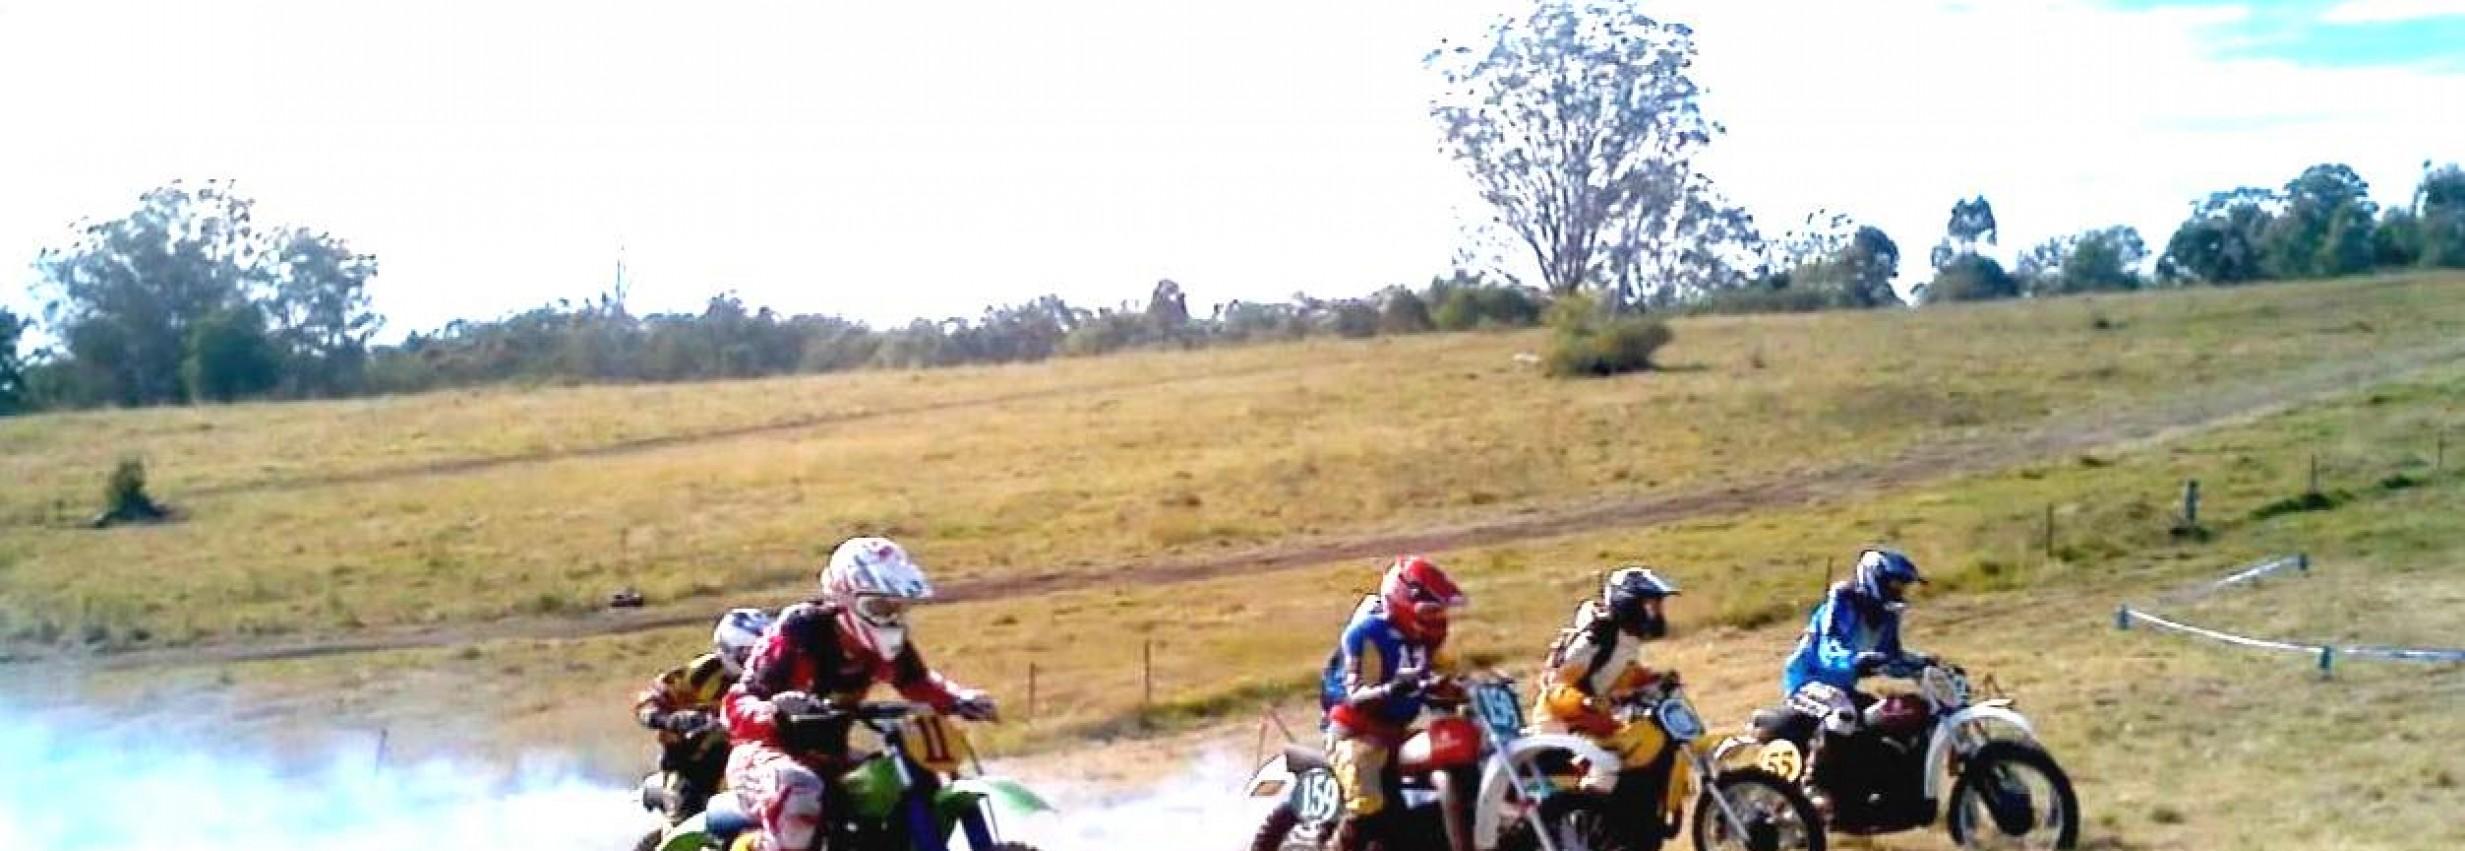 Biddaddaba Moto Track